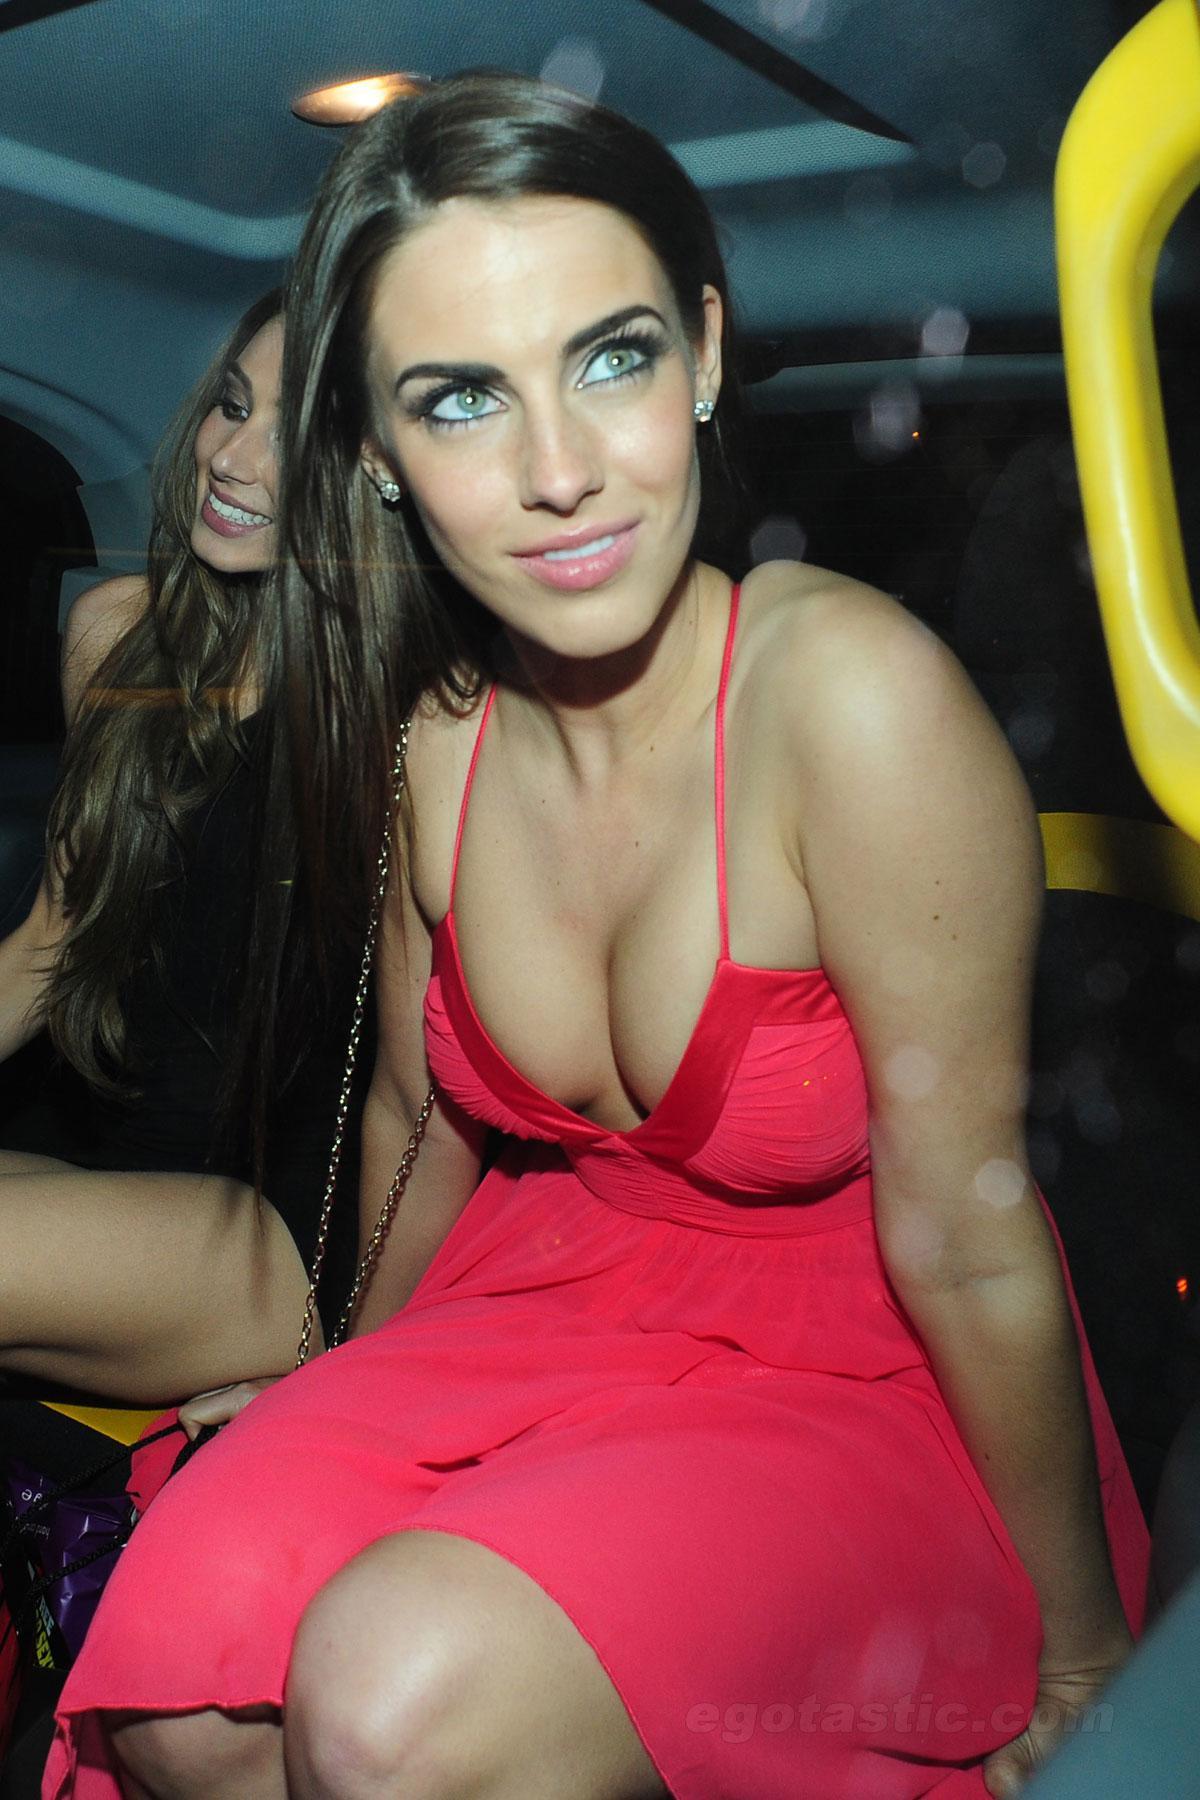 Jessica Lowndes Desnuda Página 5 Fotos Desnuda Descuido Topless